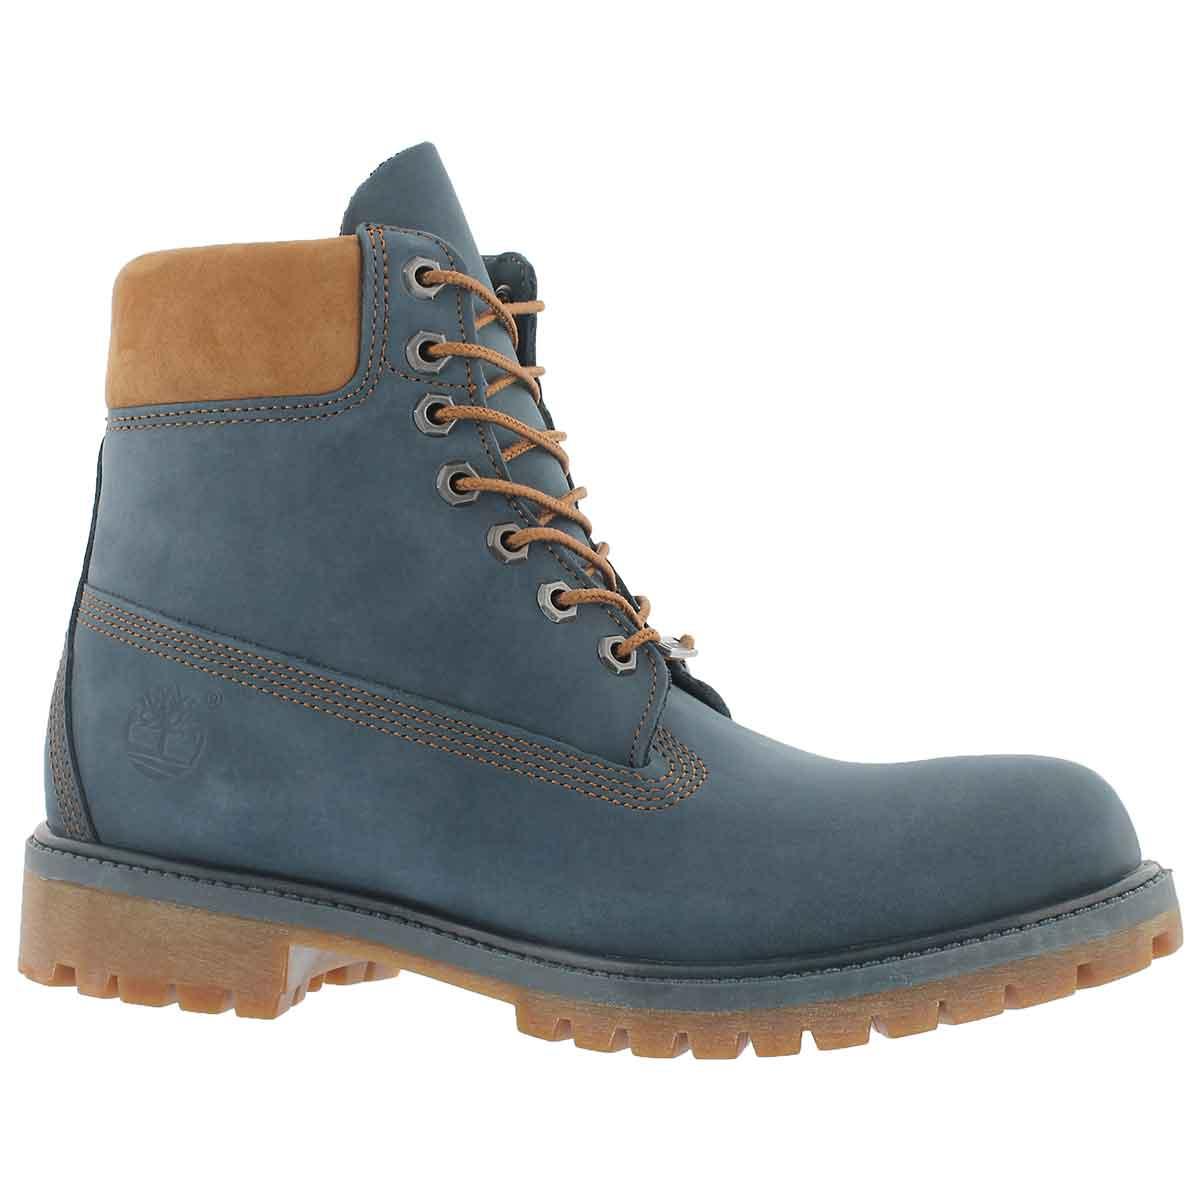 "Men's ICON 6"" PREMIUM navy work boots"